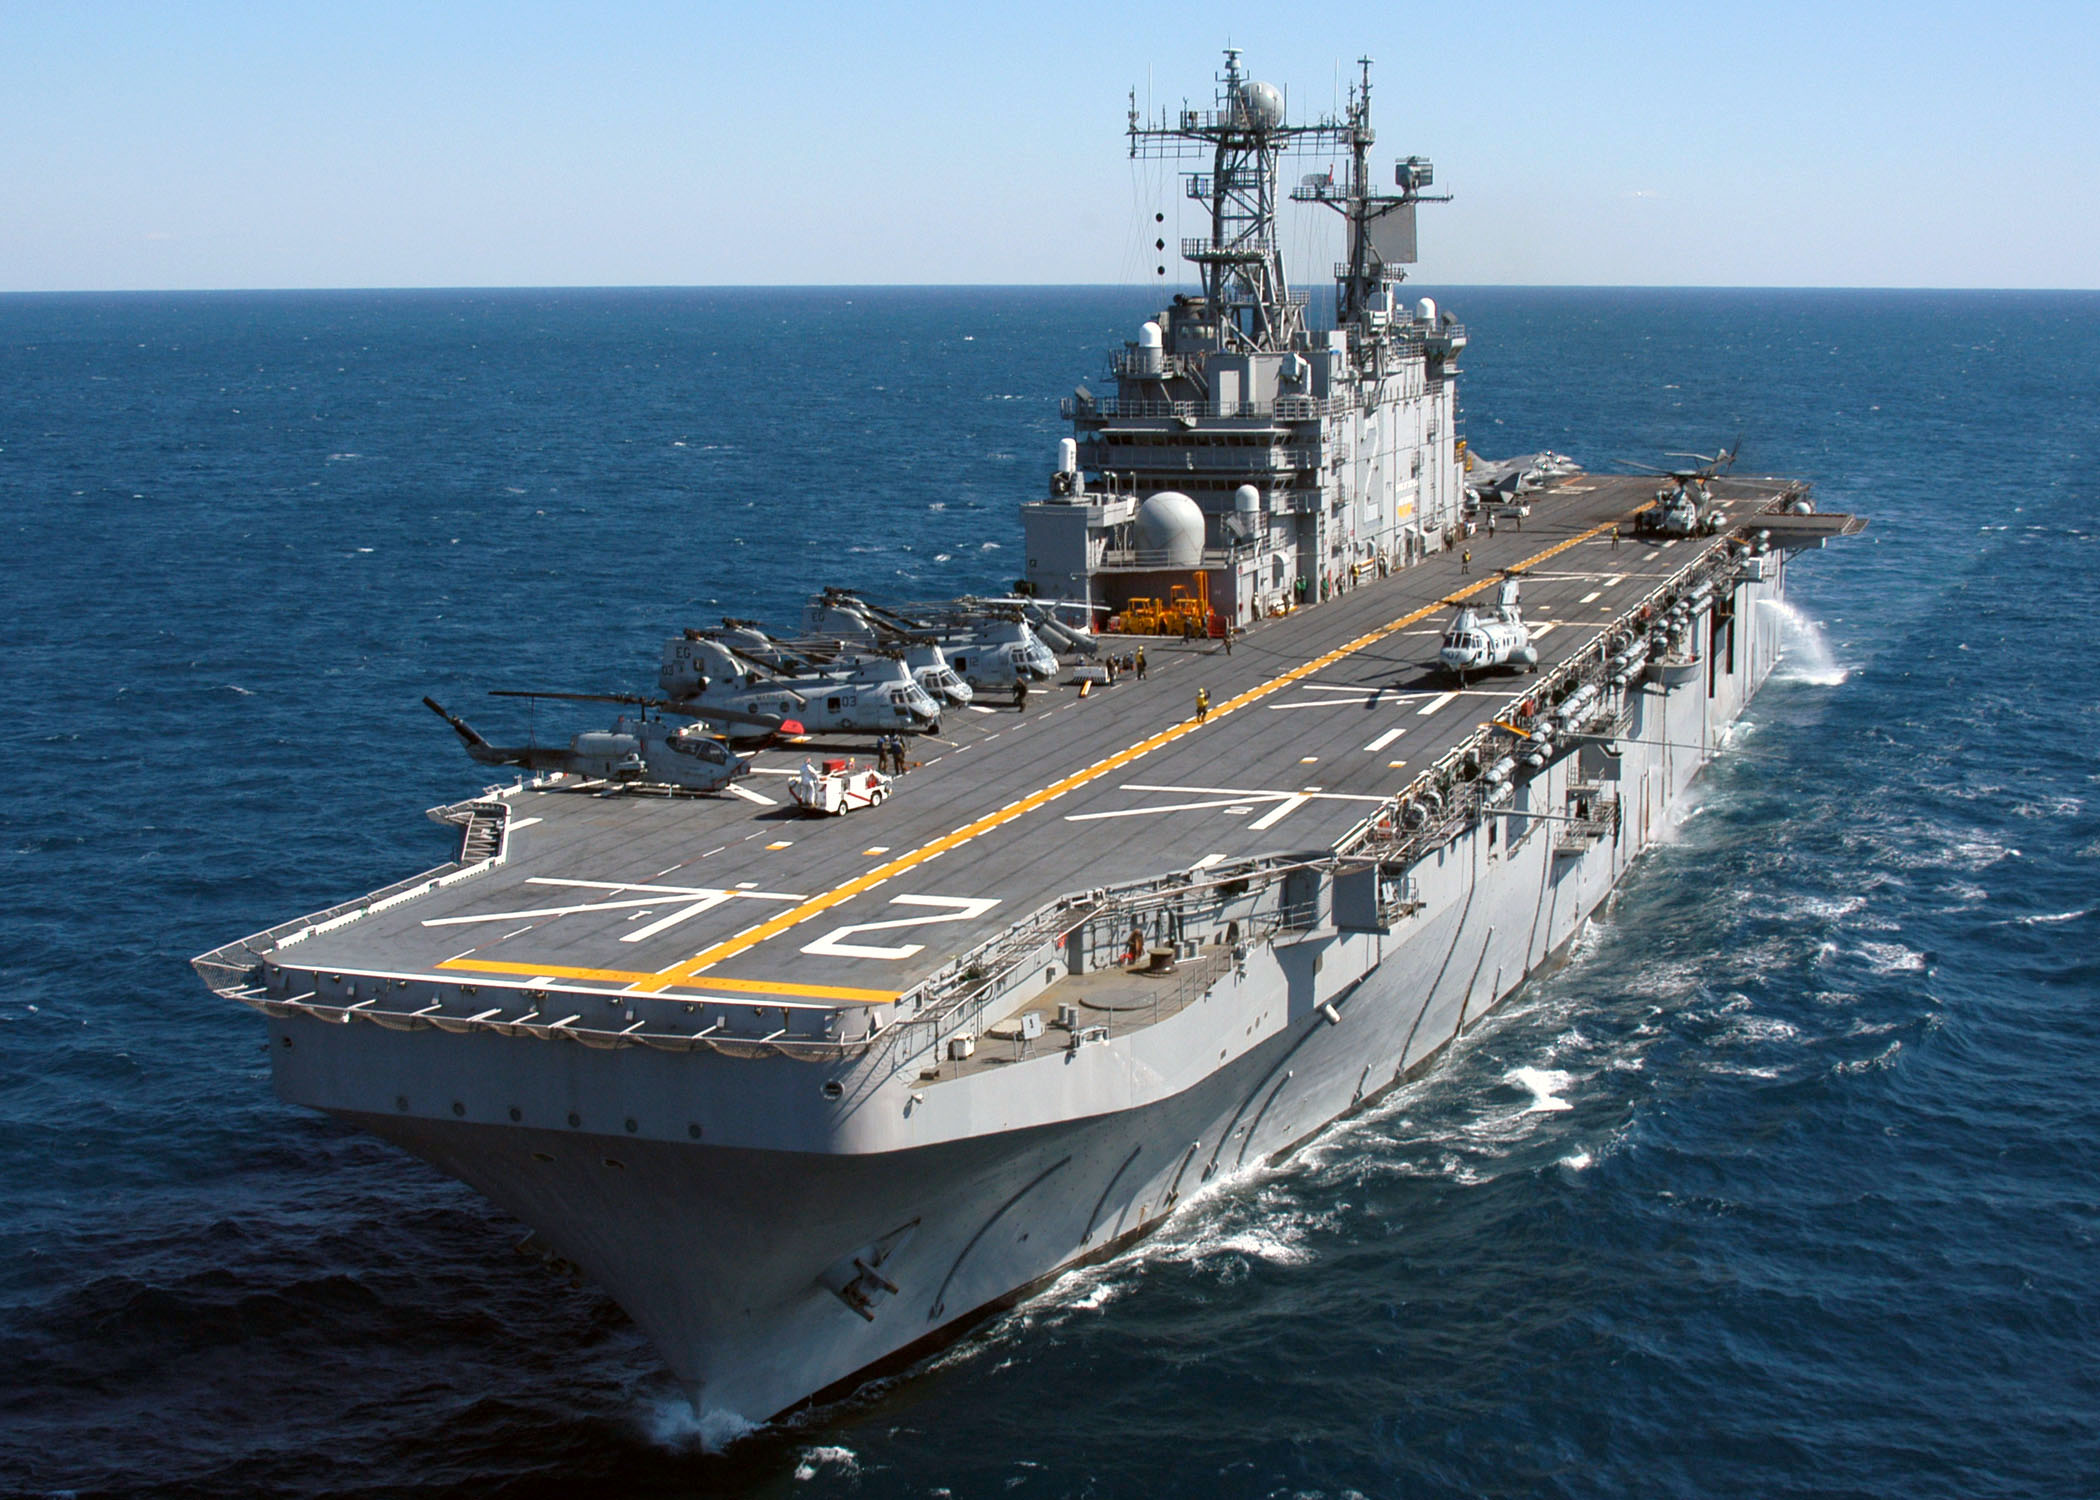 Tarawa / Wasp Class Assault